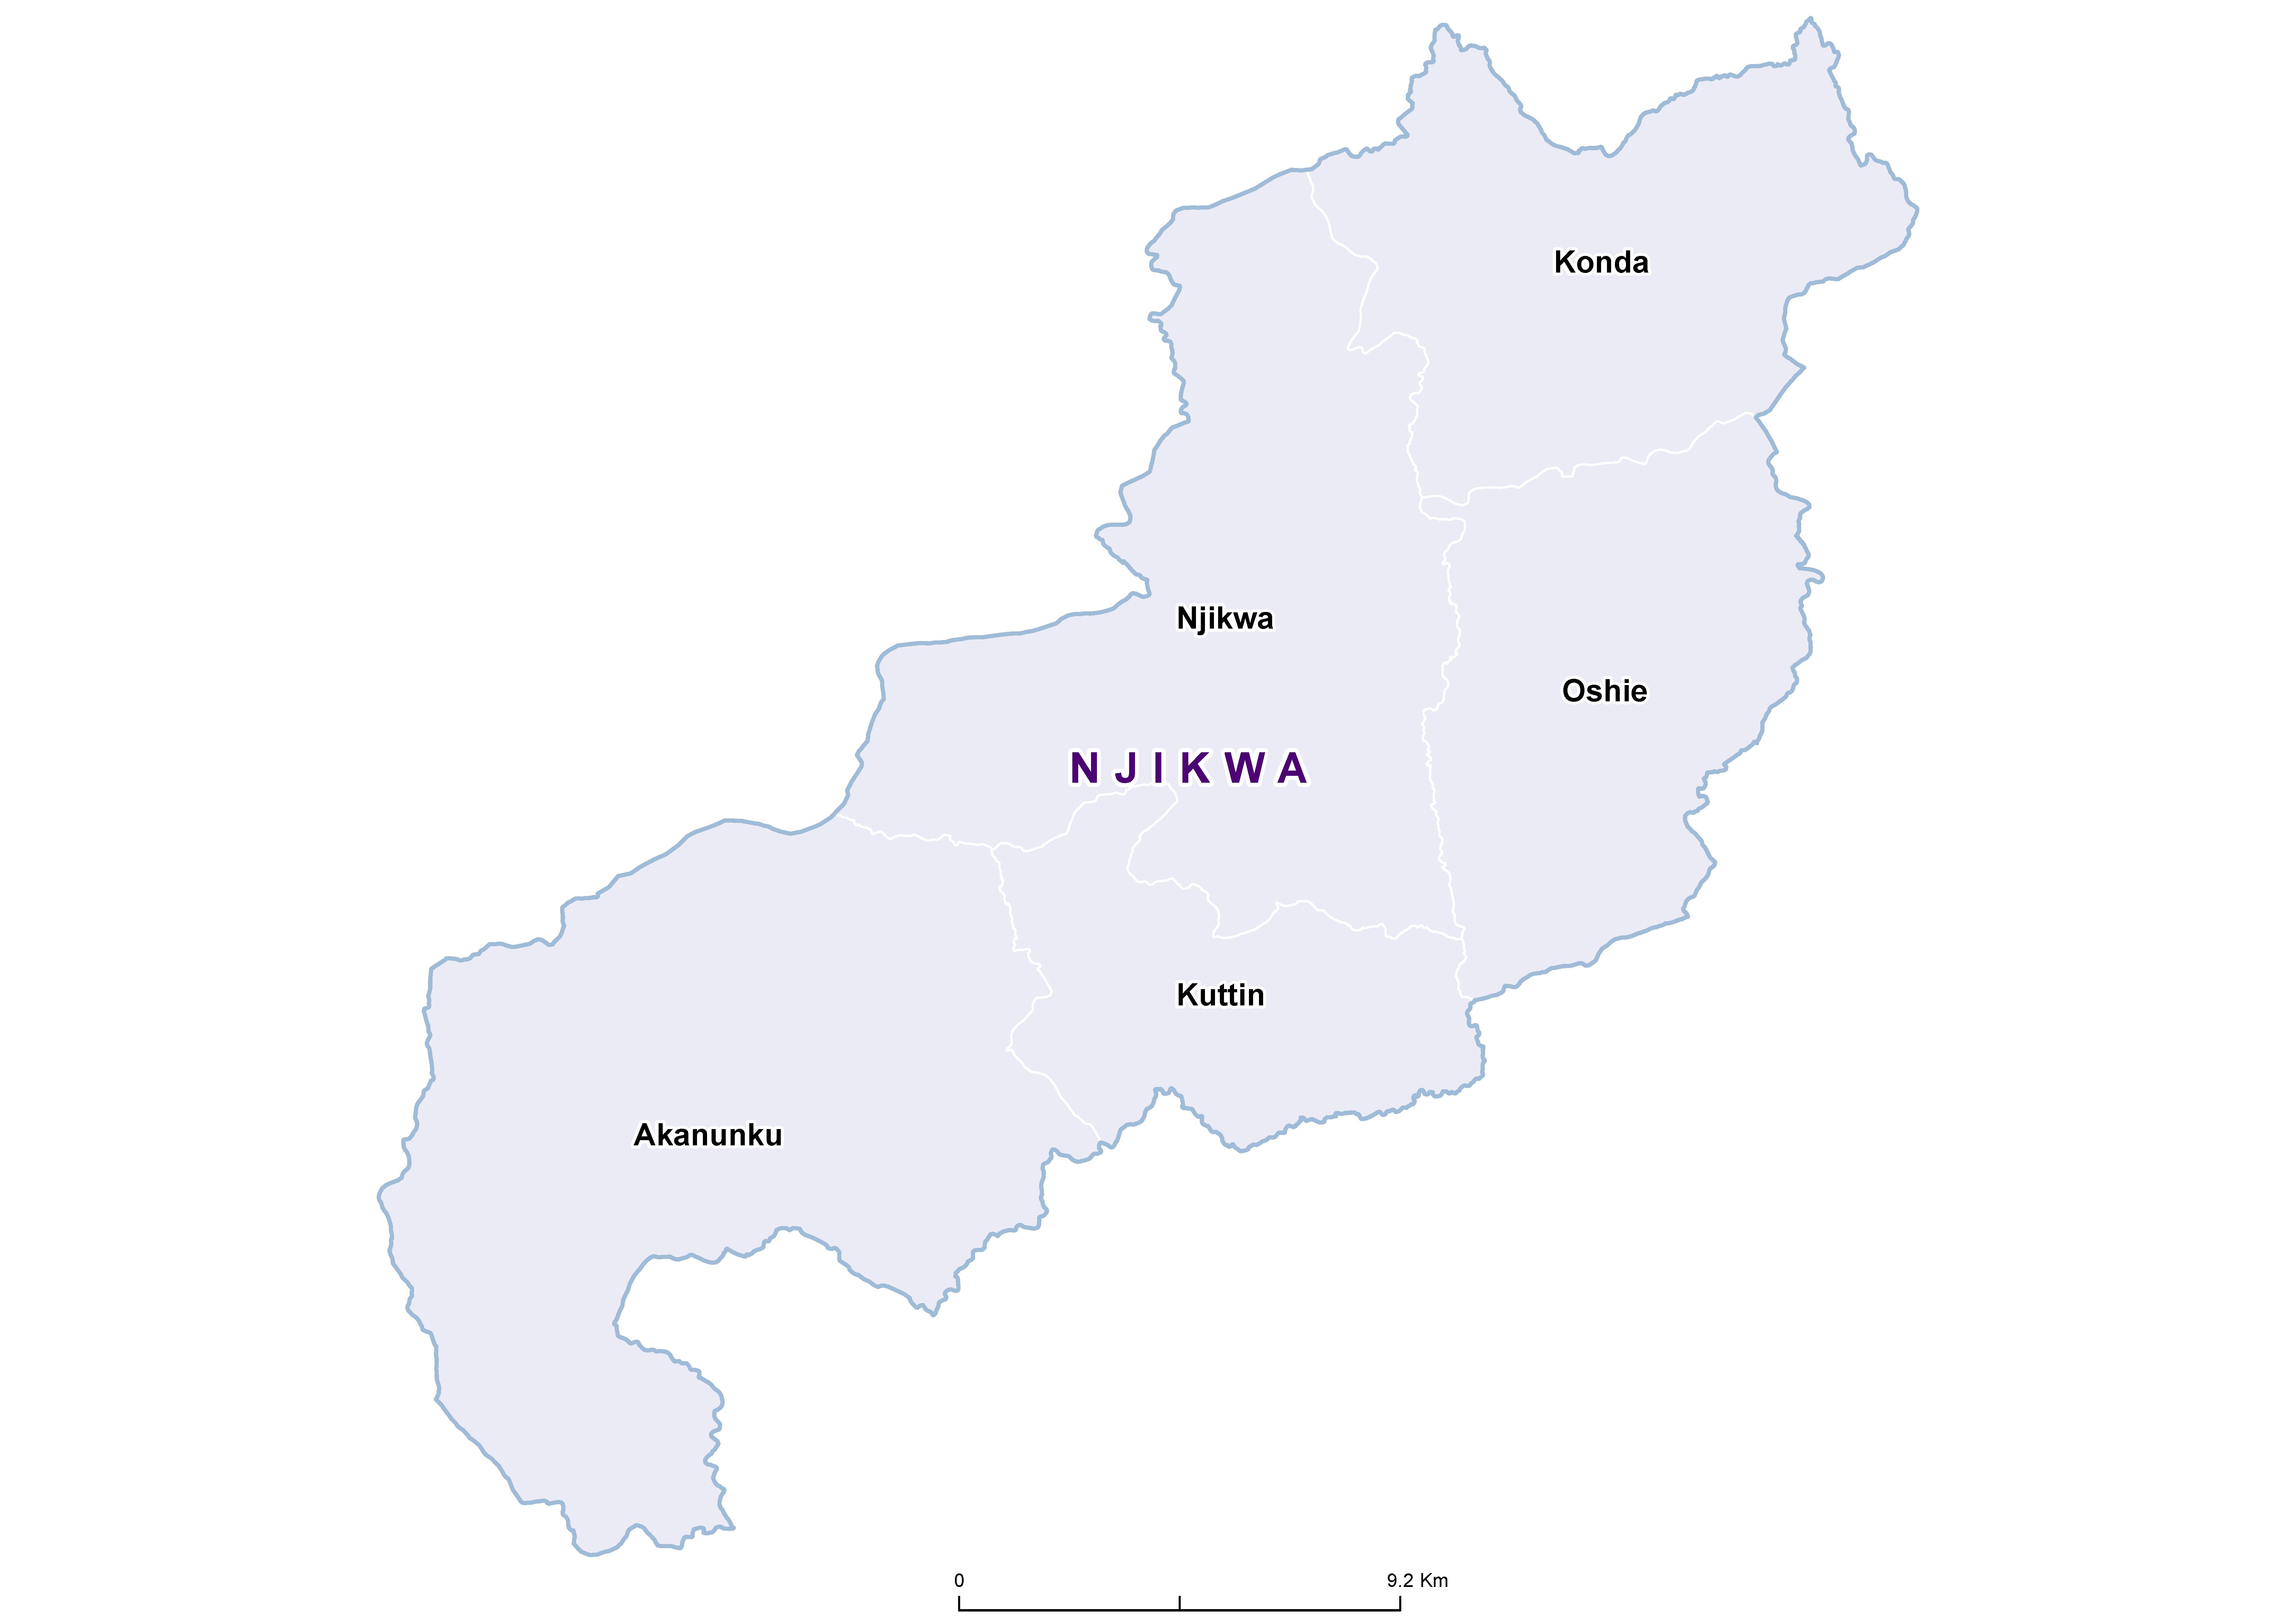 Njikwa SCH 19850001